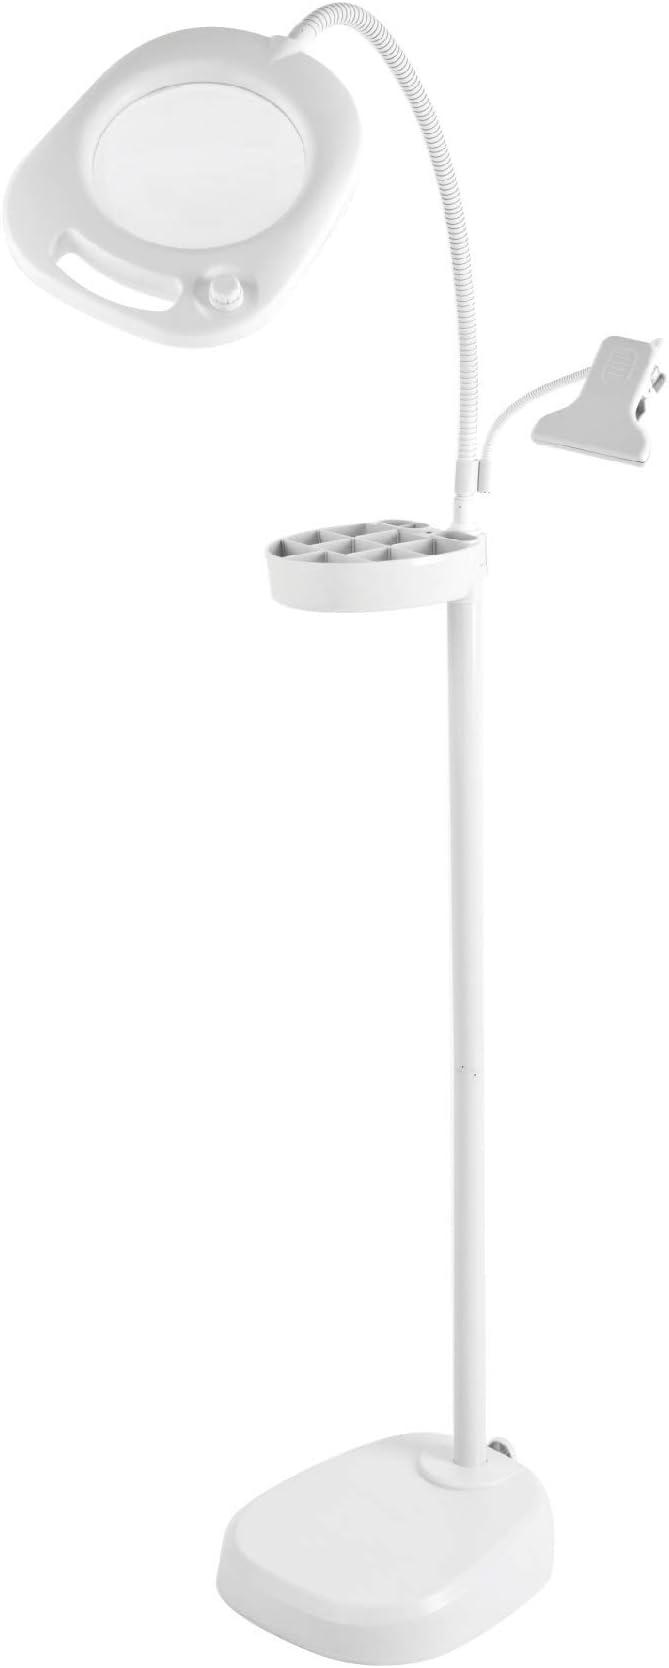 Purelite Crafters Lamp